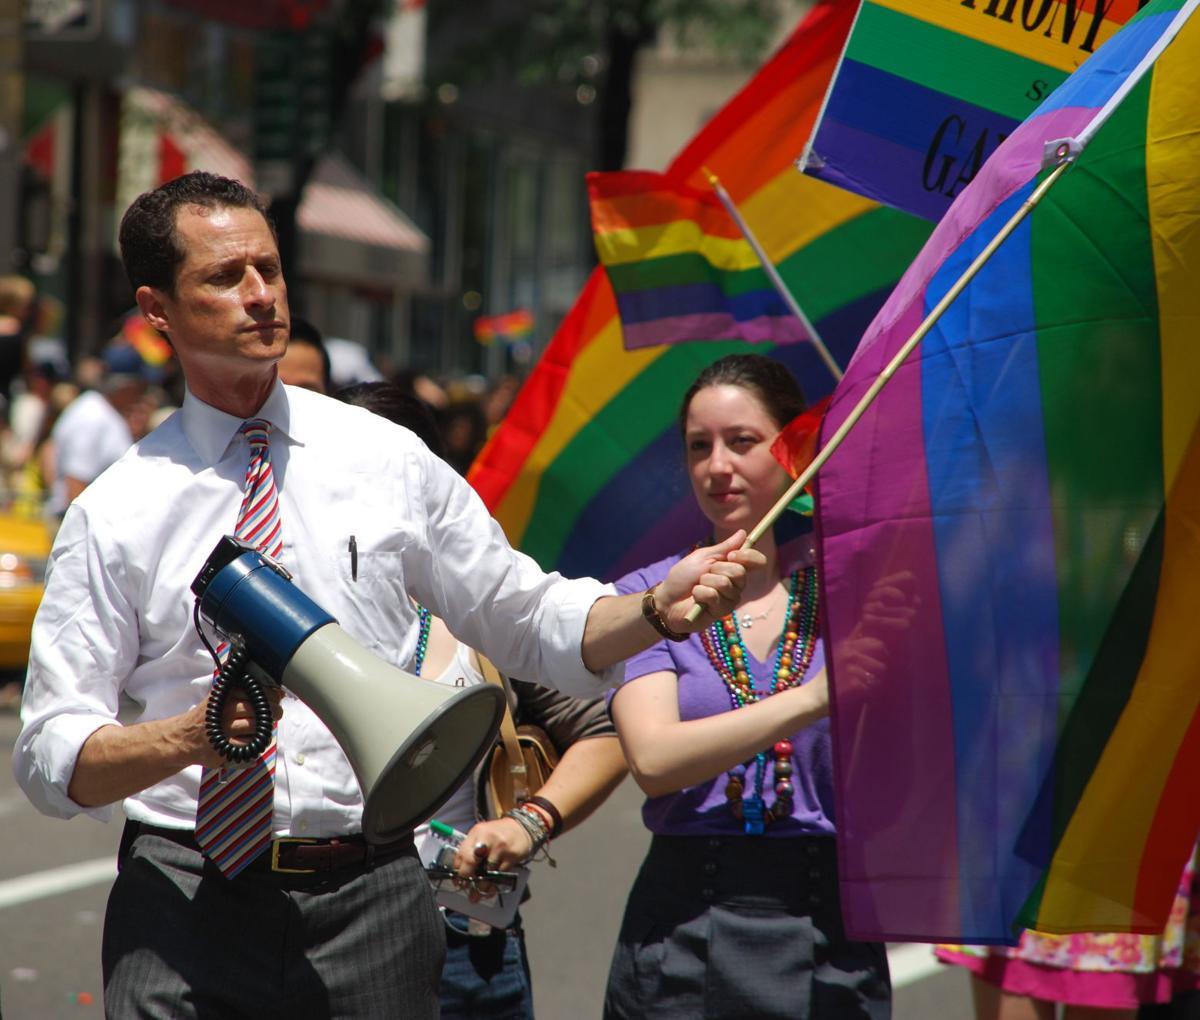 'Weiner' a meditation on public shaming